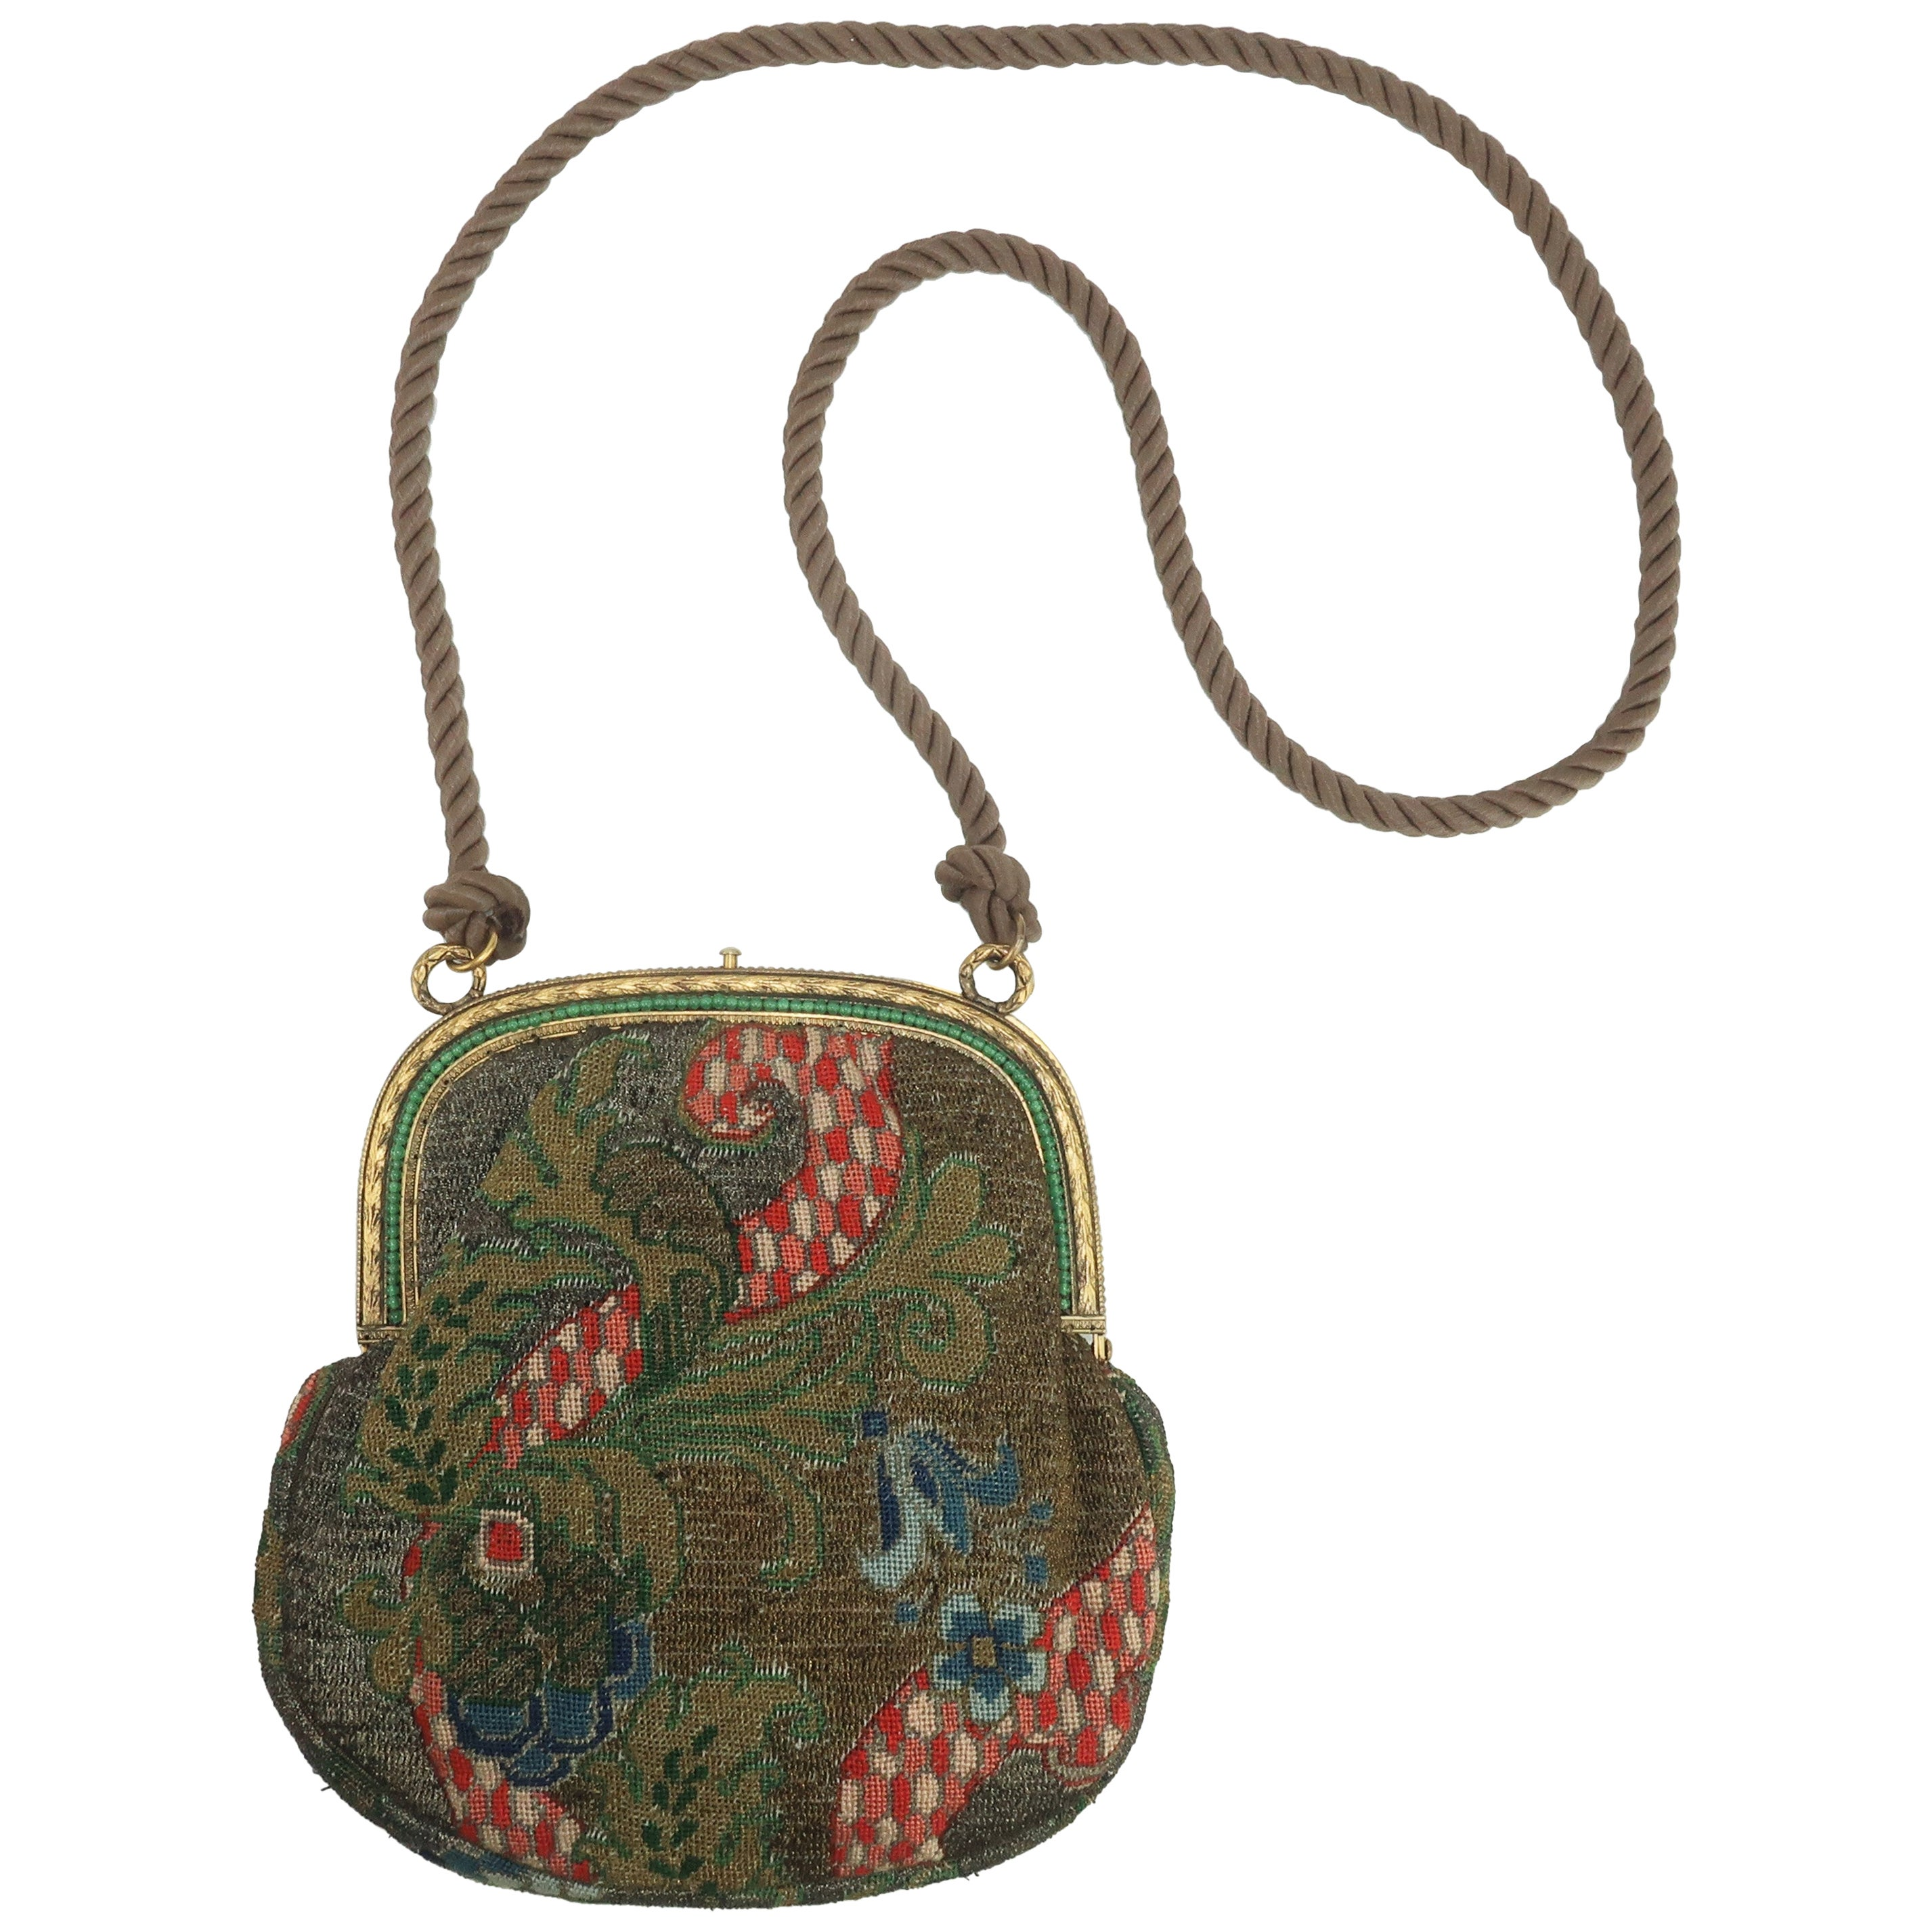 Vintage French Art Deco Metallic Petit Point Handbag